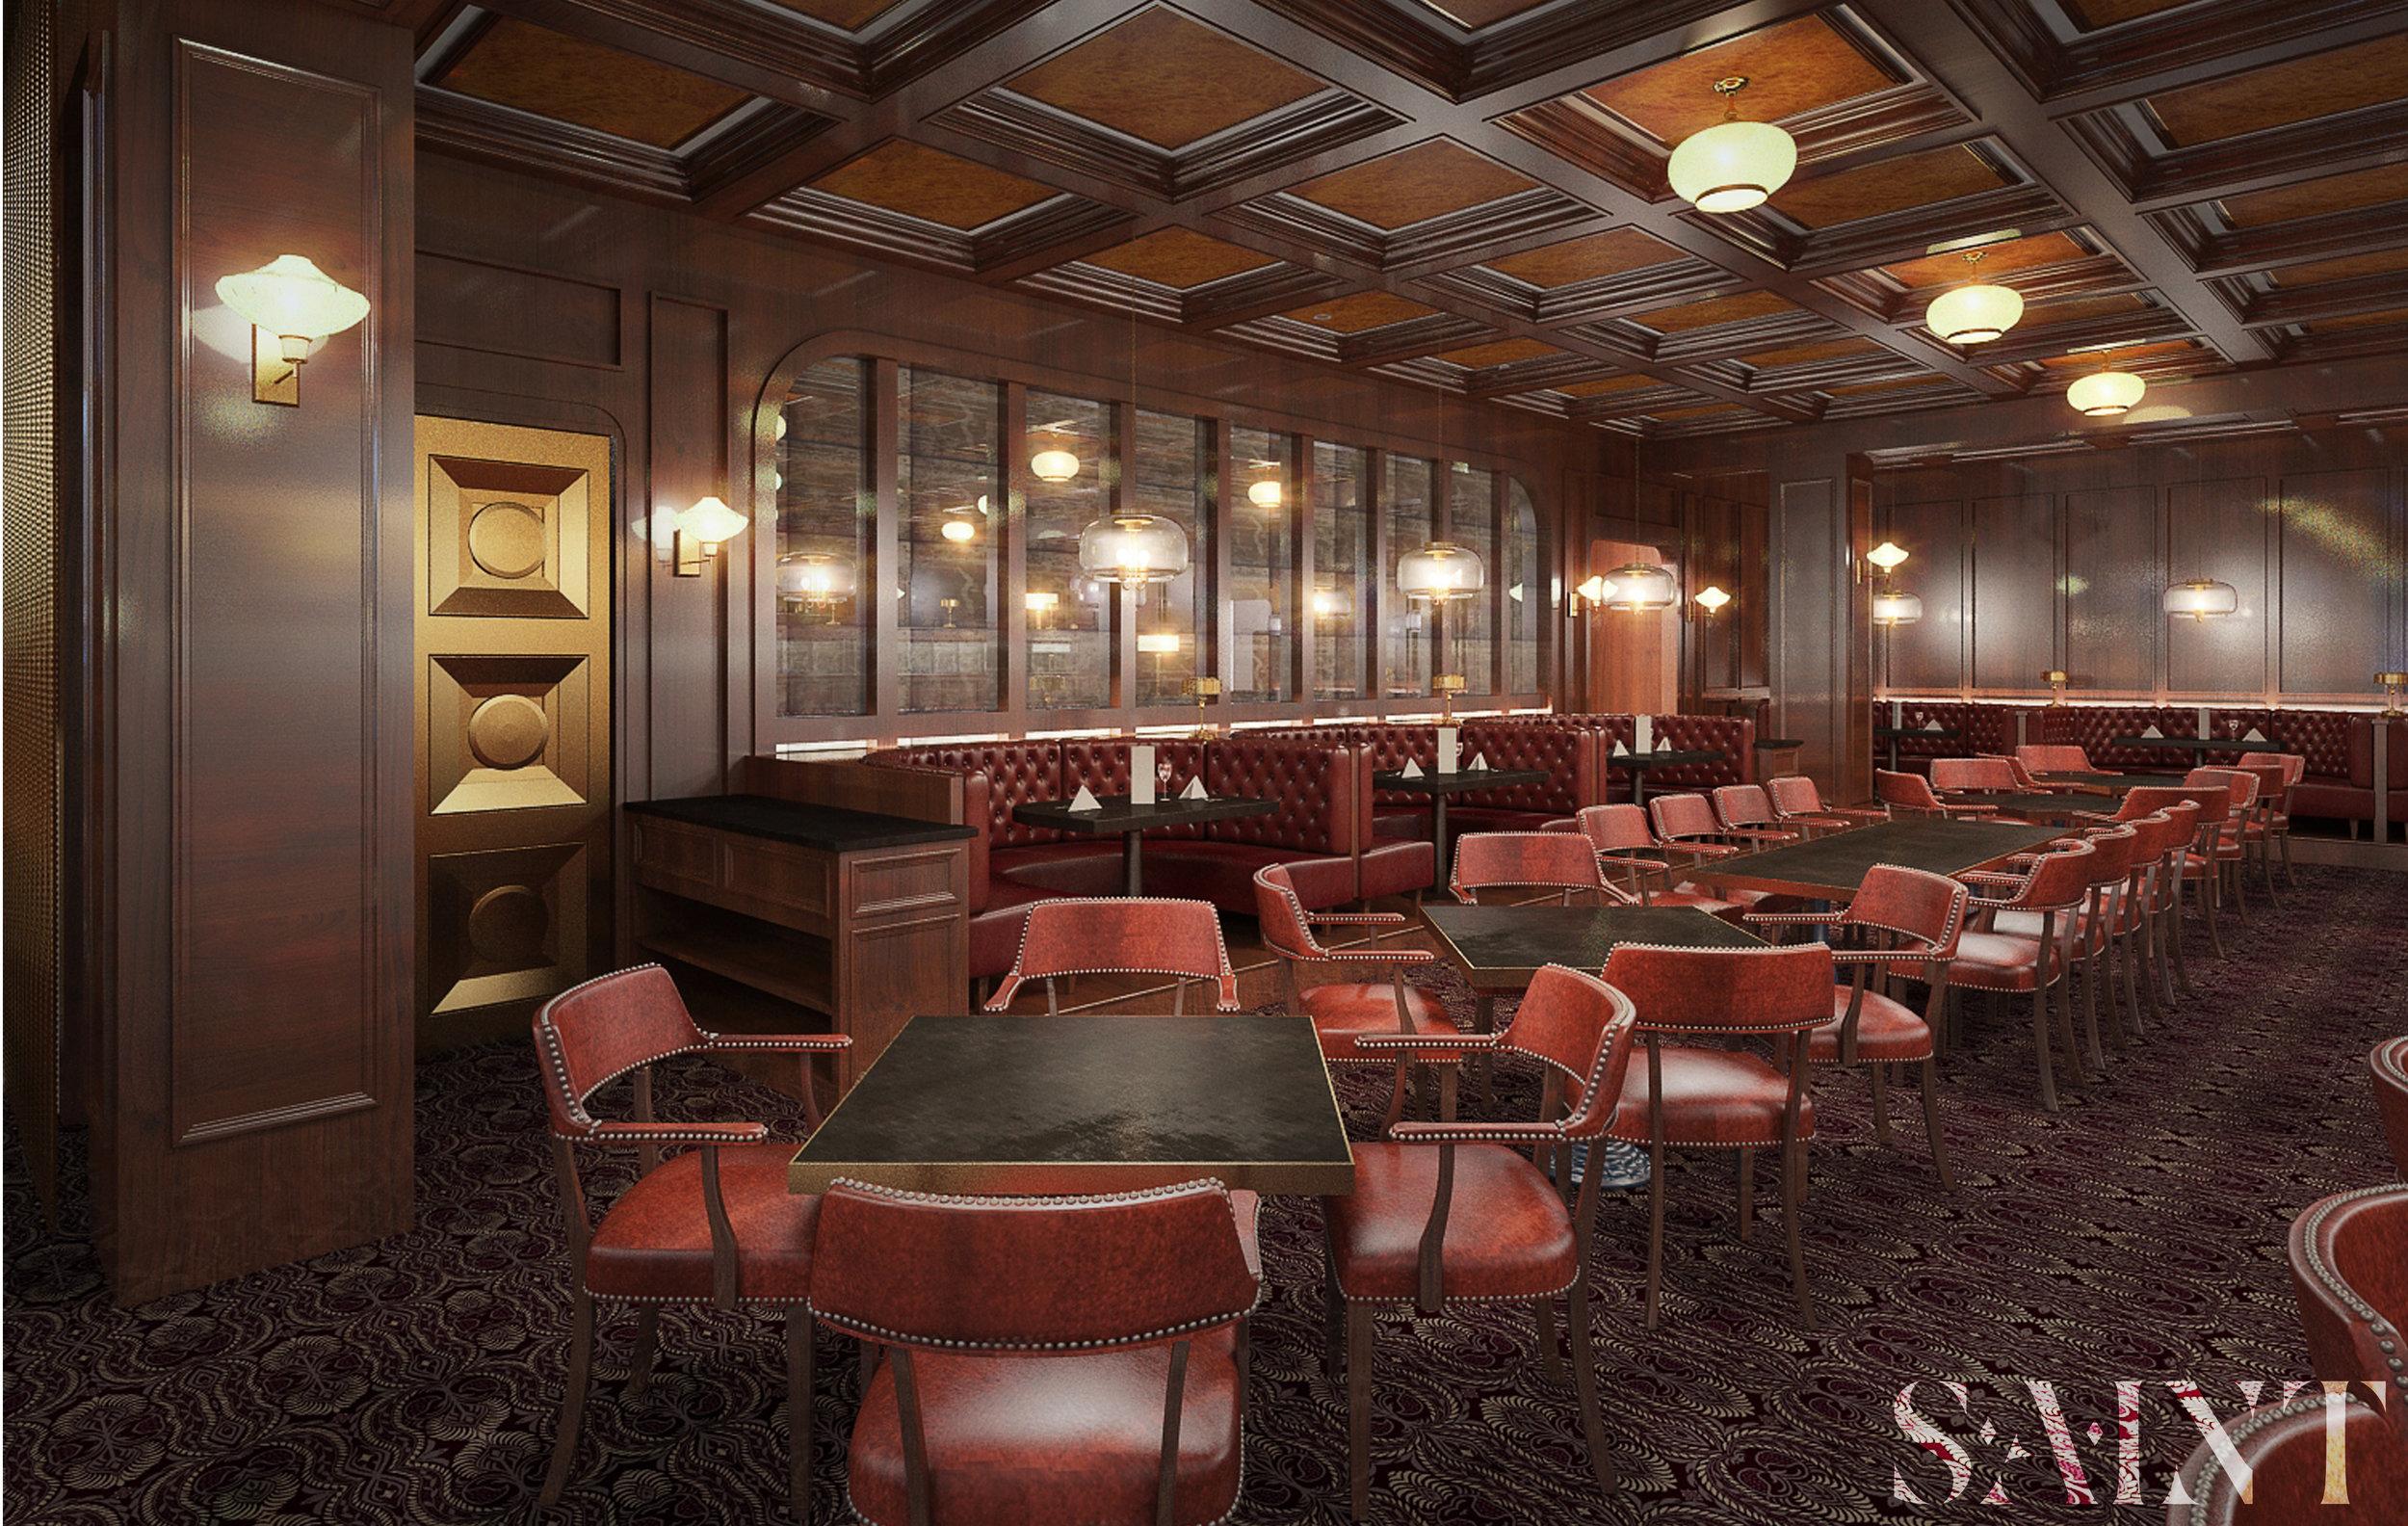 studio-saint-bars-and-restaurants-rare-steakhouse-washington-dc-rendering-3